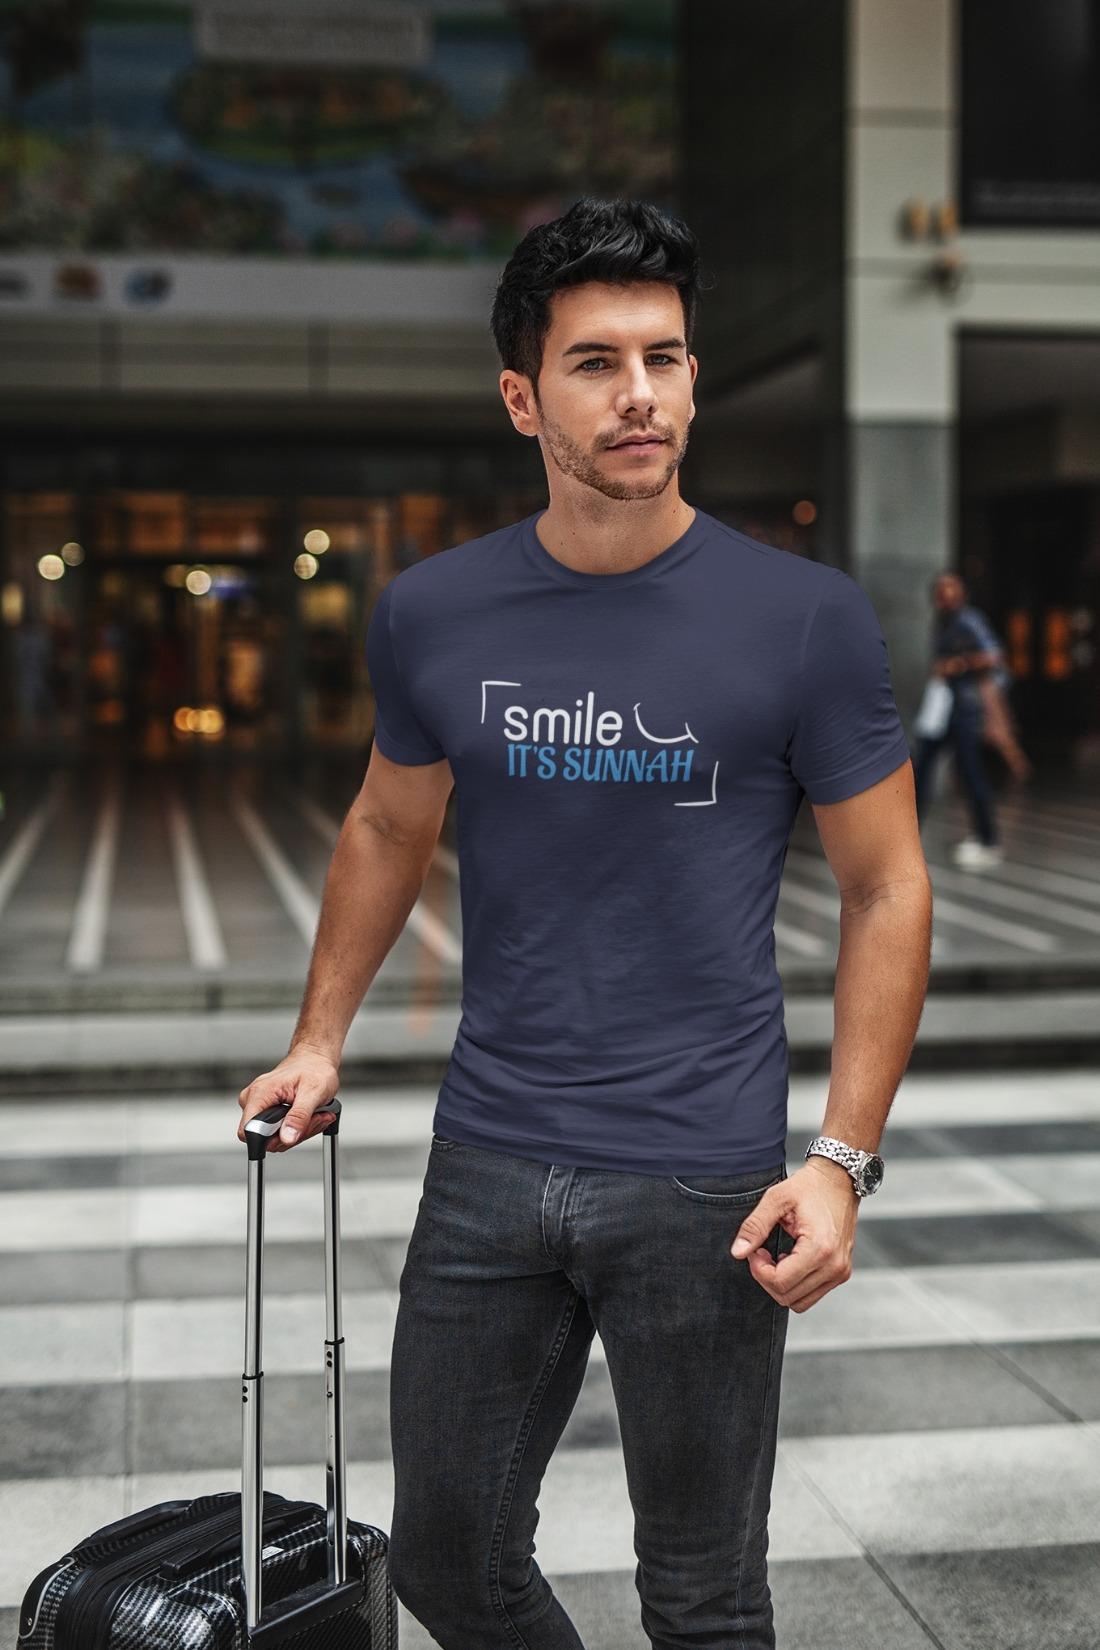 "smile """